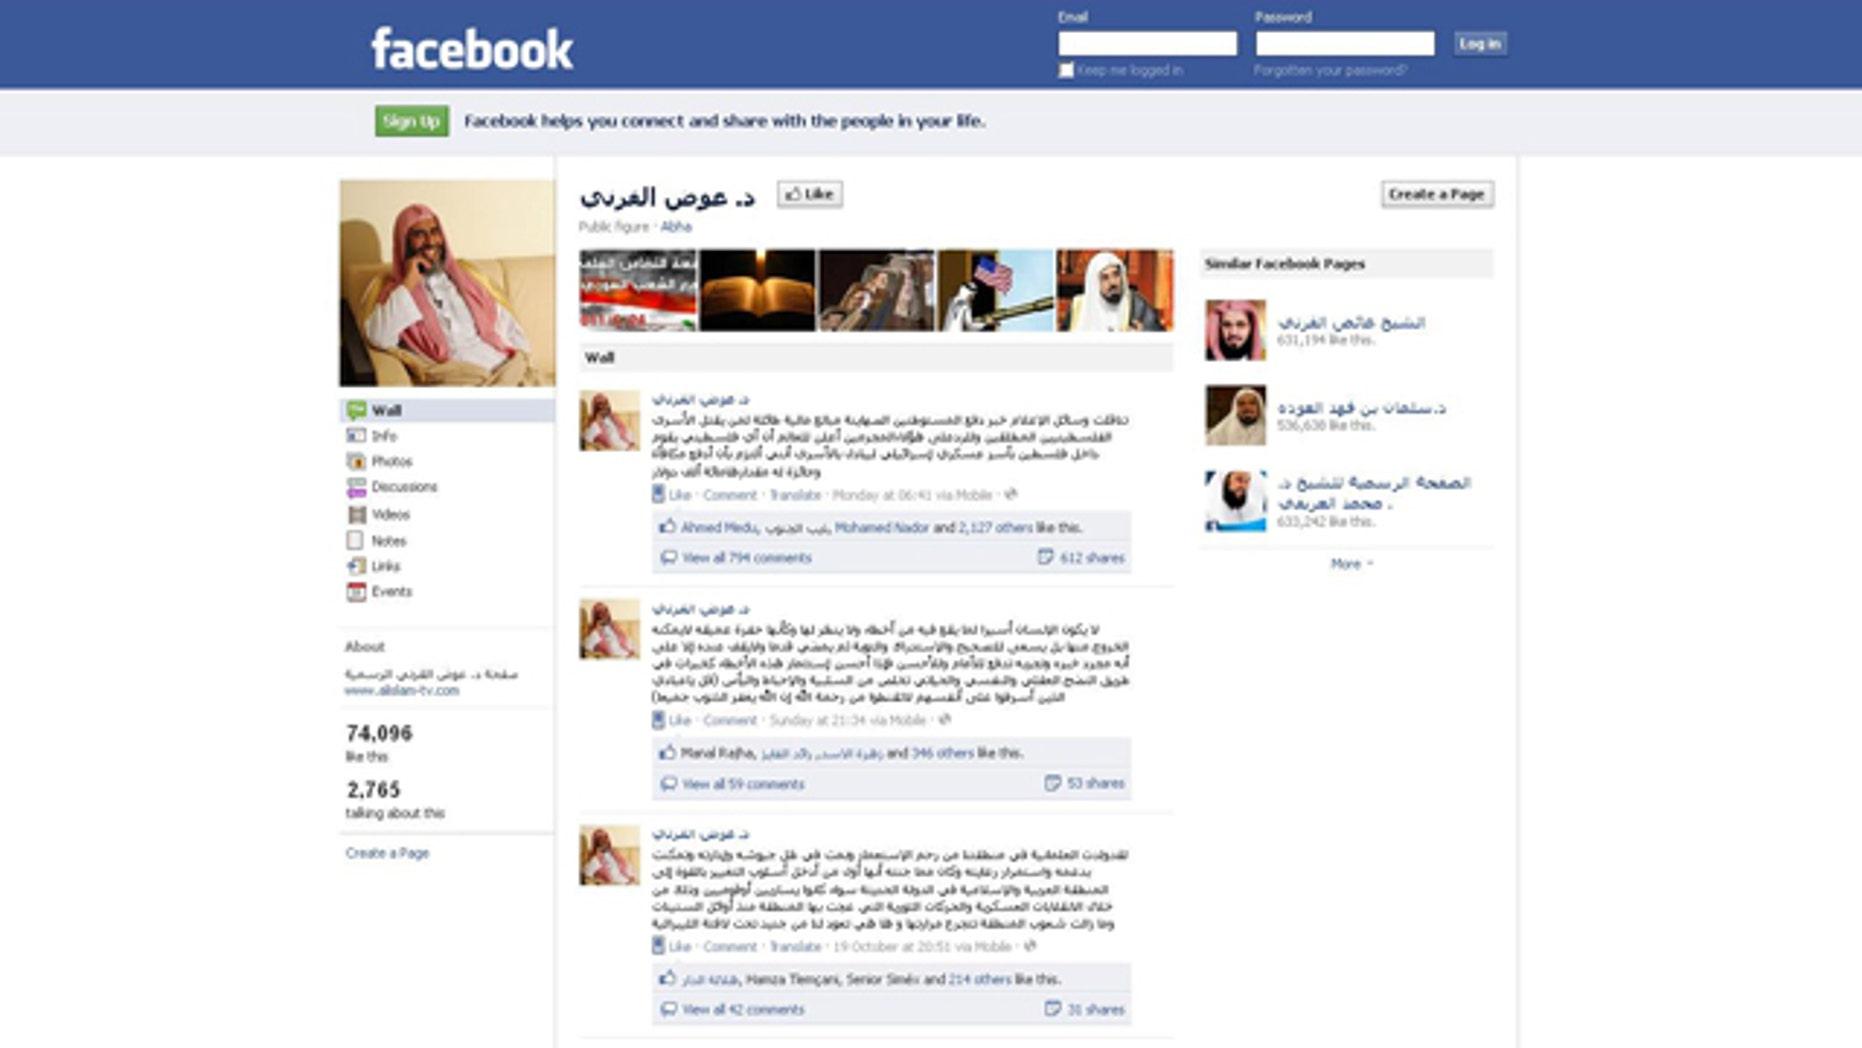 Awad al-Qarni's Facebook page.